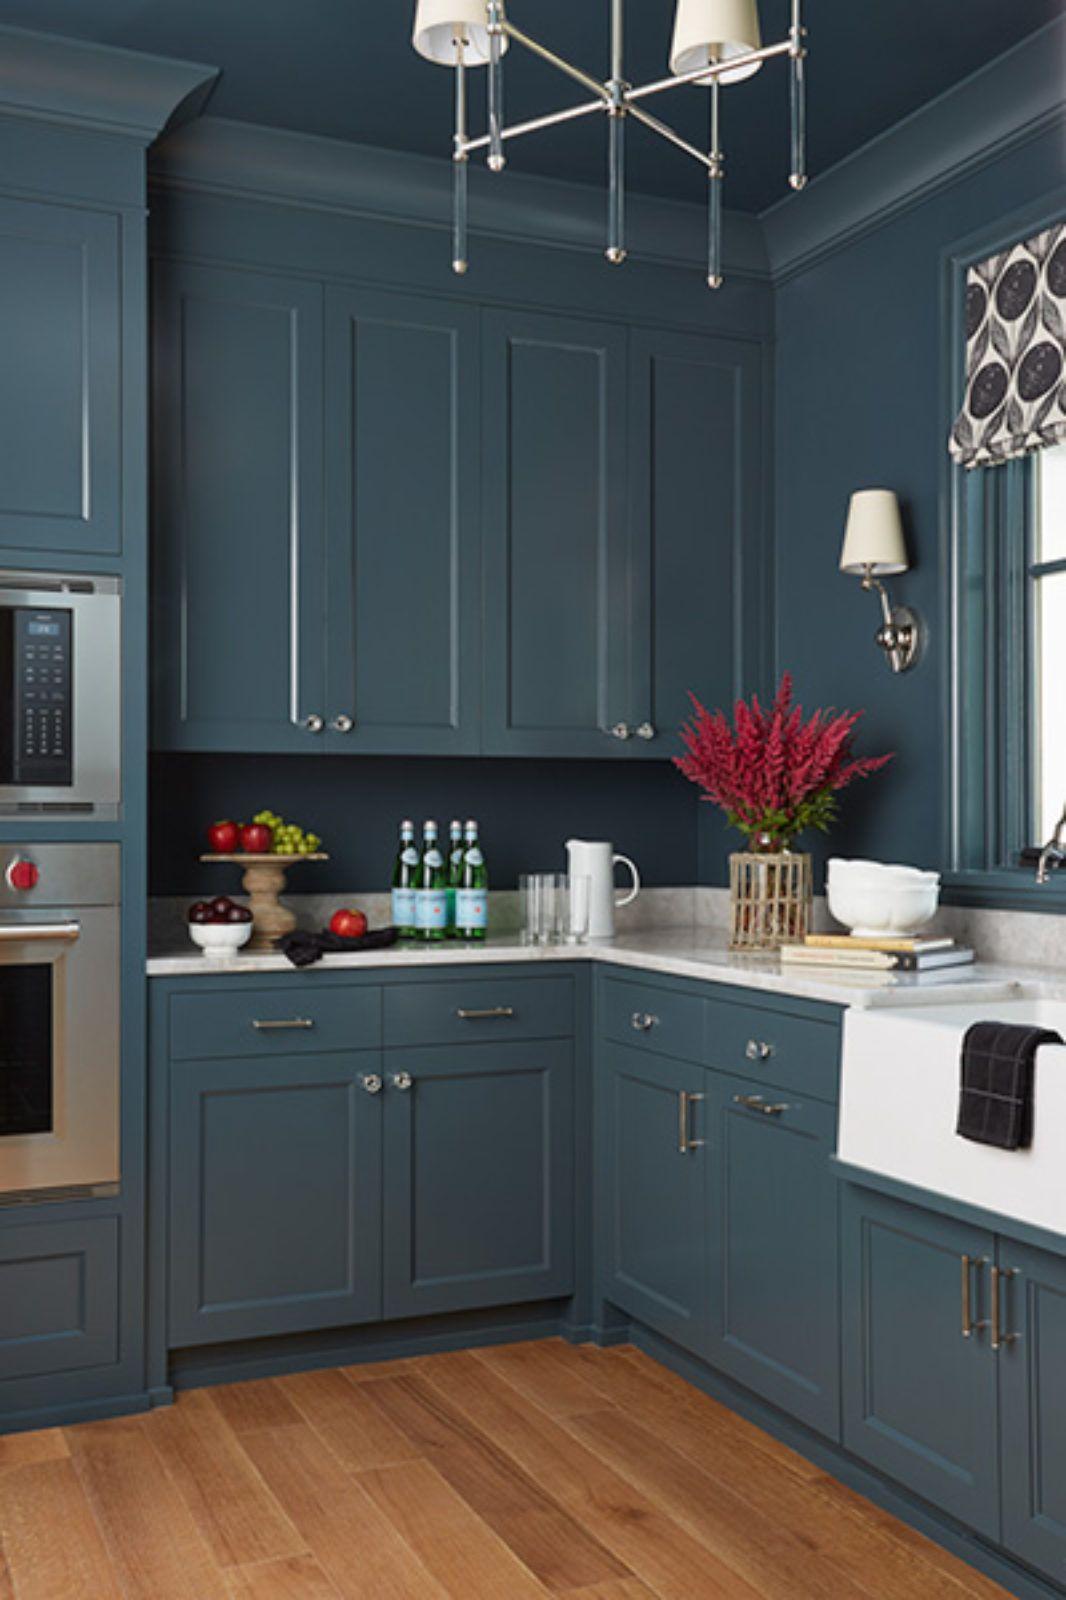 Modern English Tudor Vivid Interior In 2020 Kitchen Wall Cabinets Blue Kitchen Walls Teal Kitchen